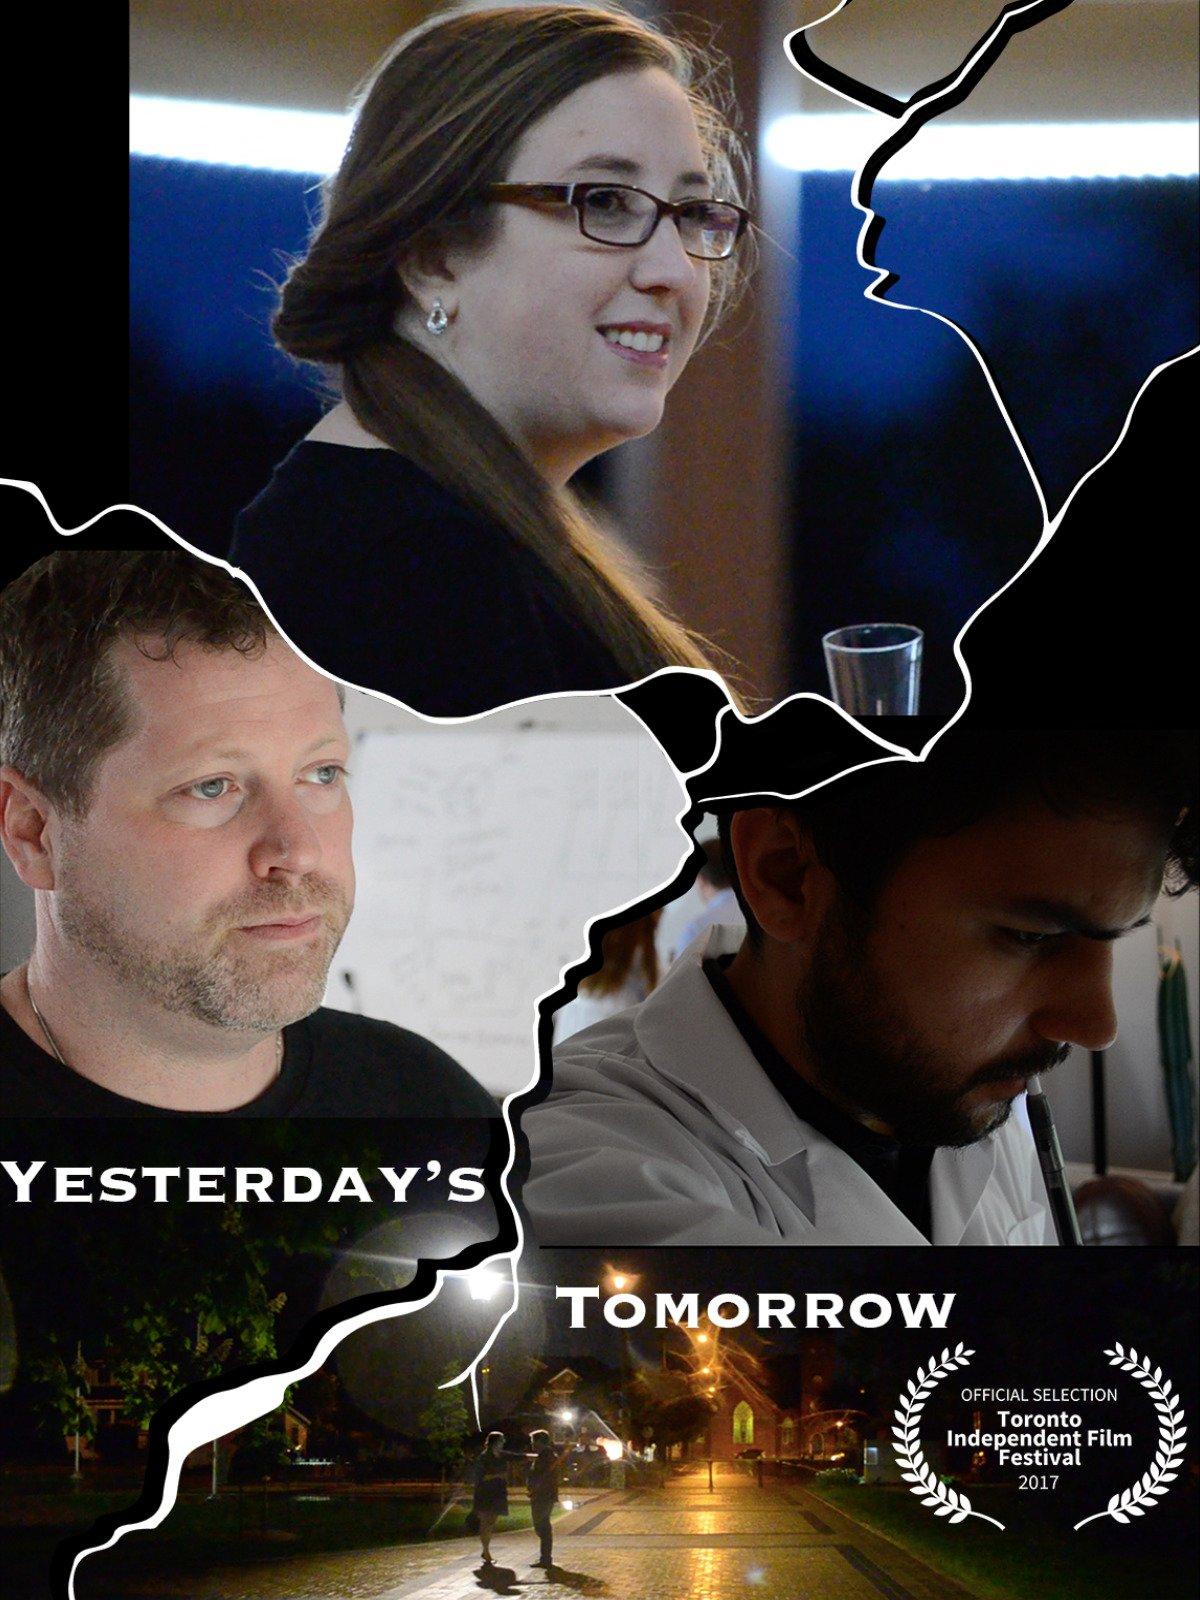 Yesterday's Tomorrow